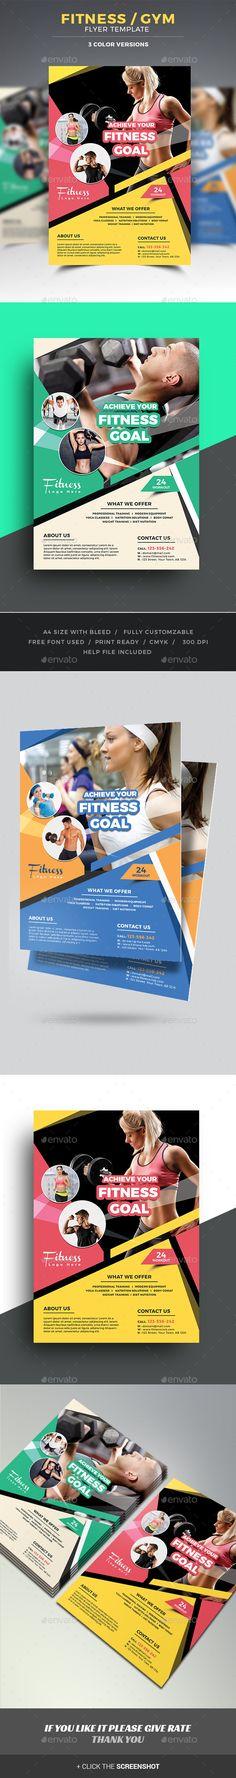 Fitness Flyer Template PSD. Download here: http://graphicriver.net/item/fitness-flyer/15926667?ref=ksioks